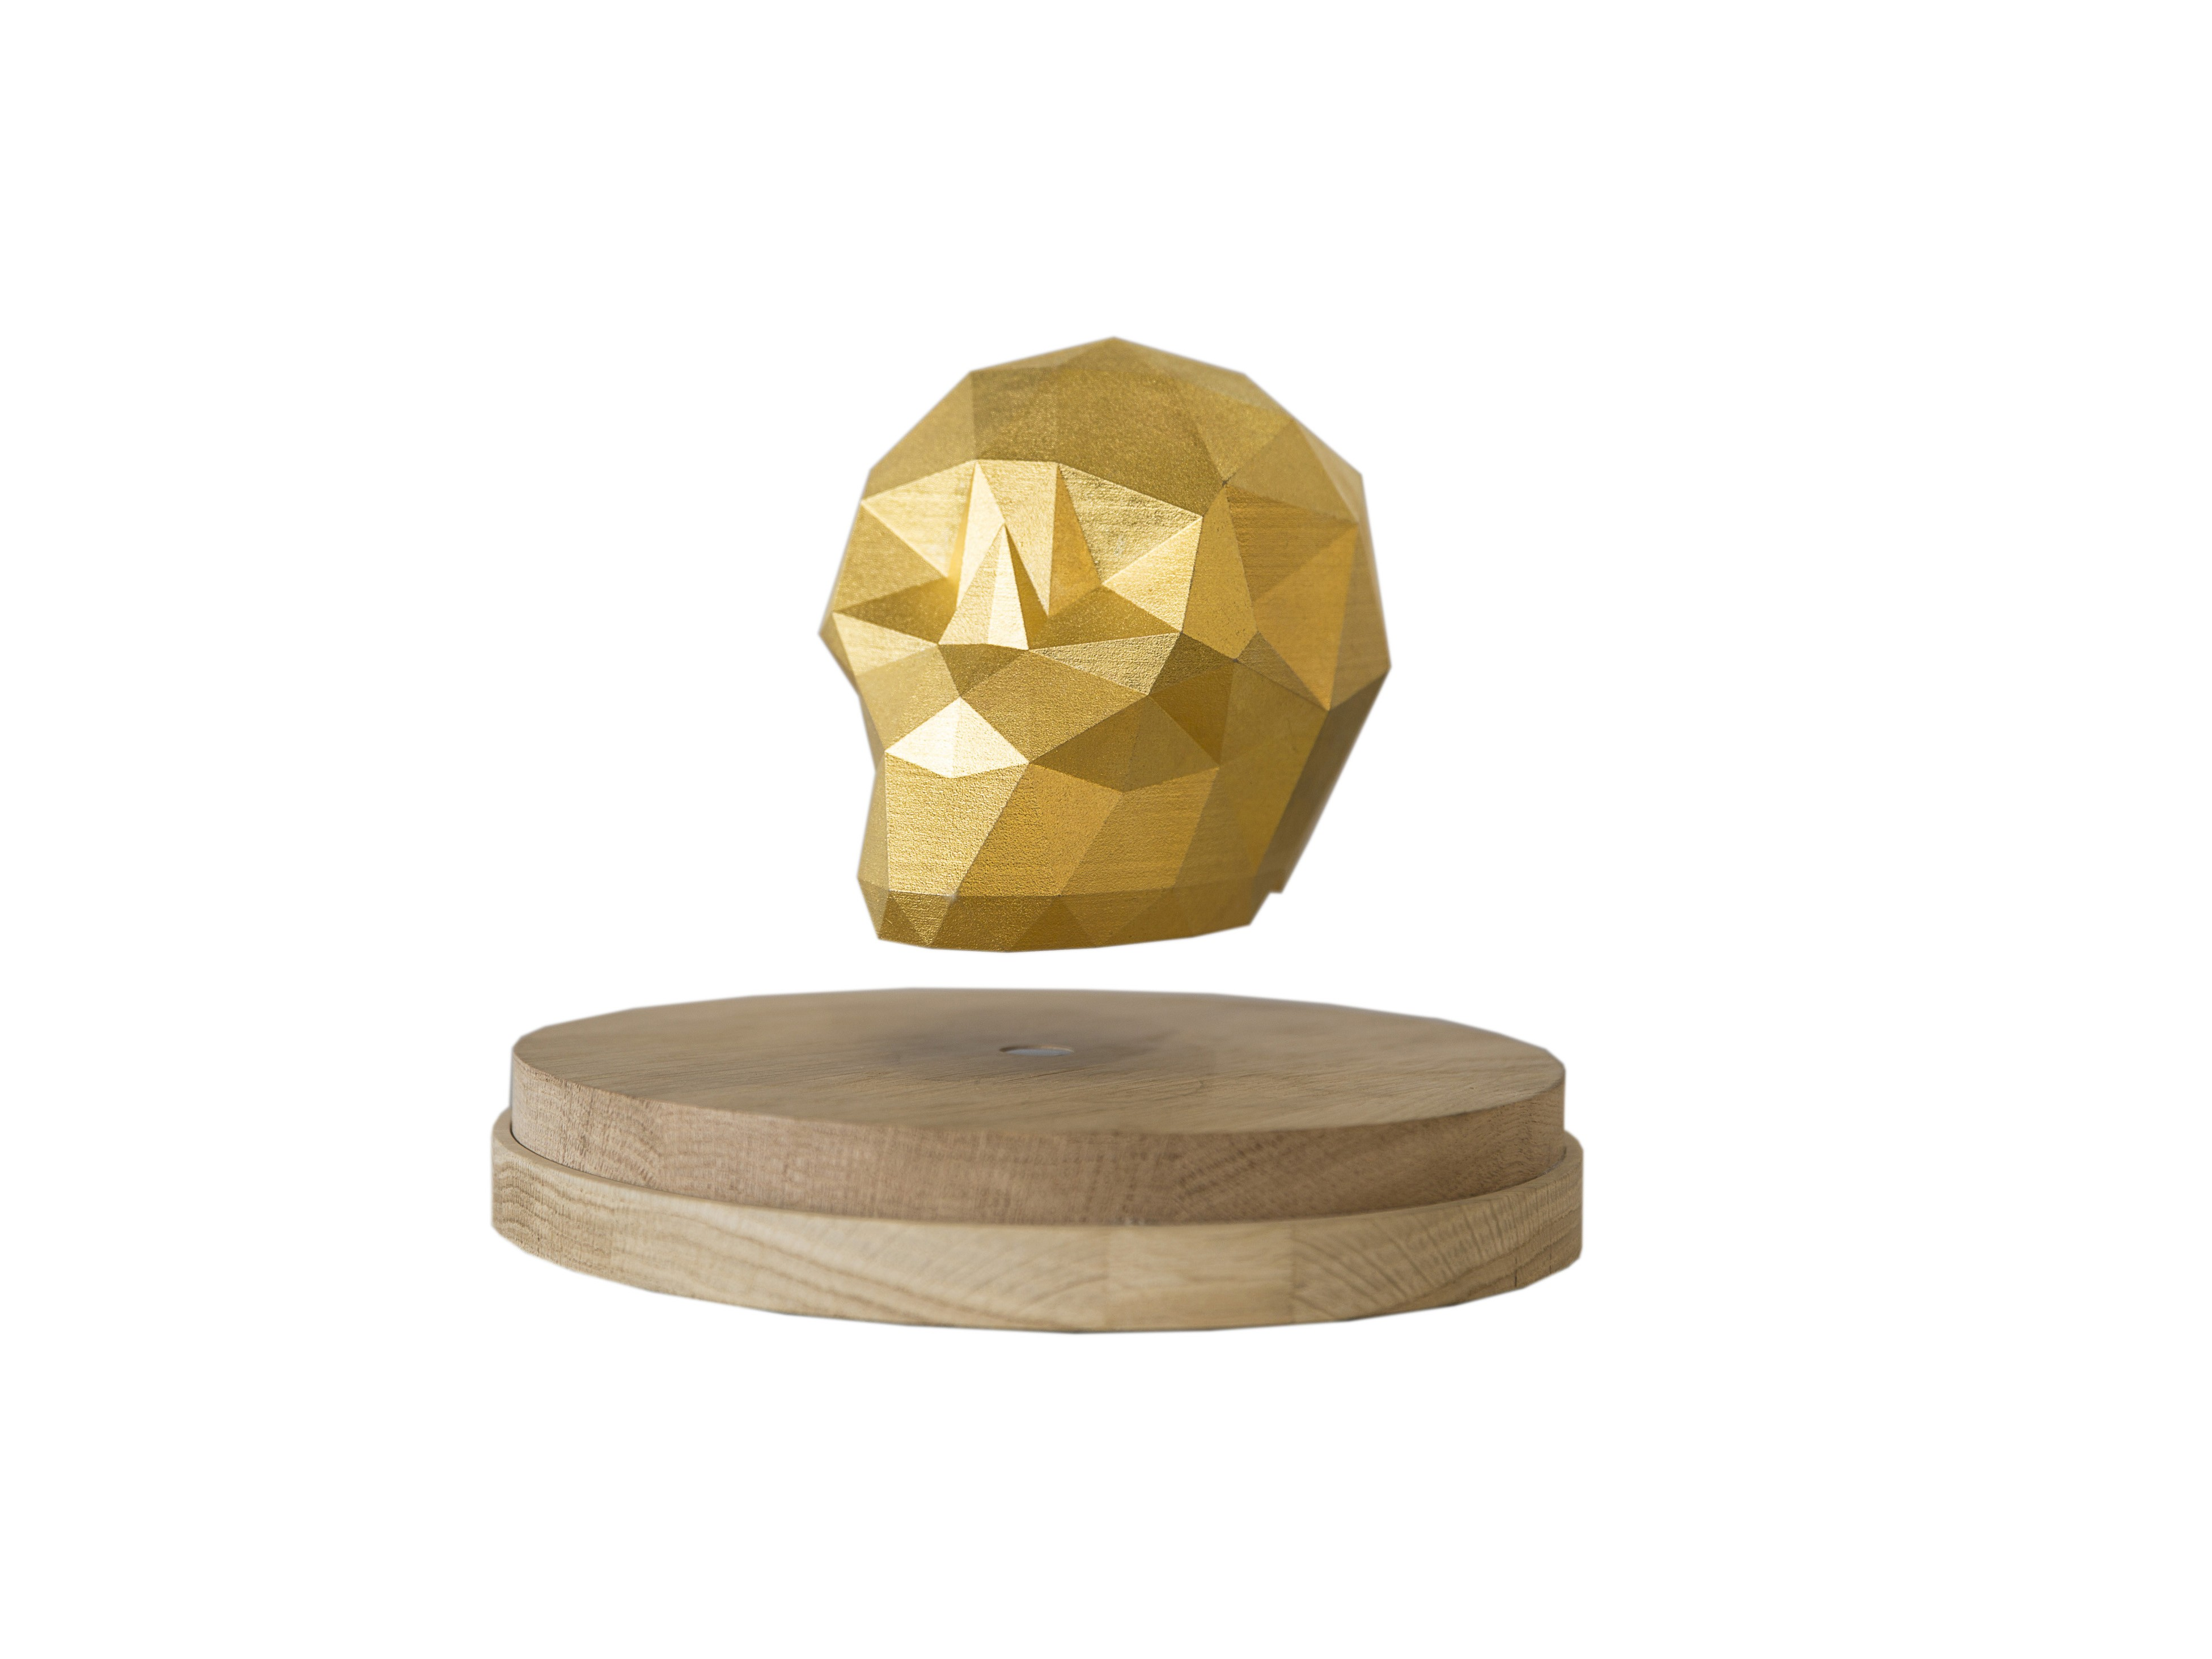 Ankou levitating skull